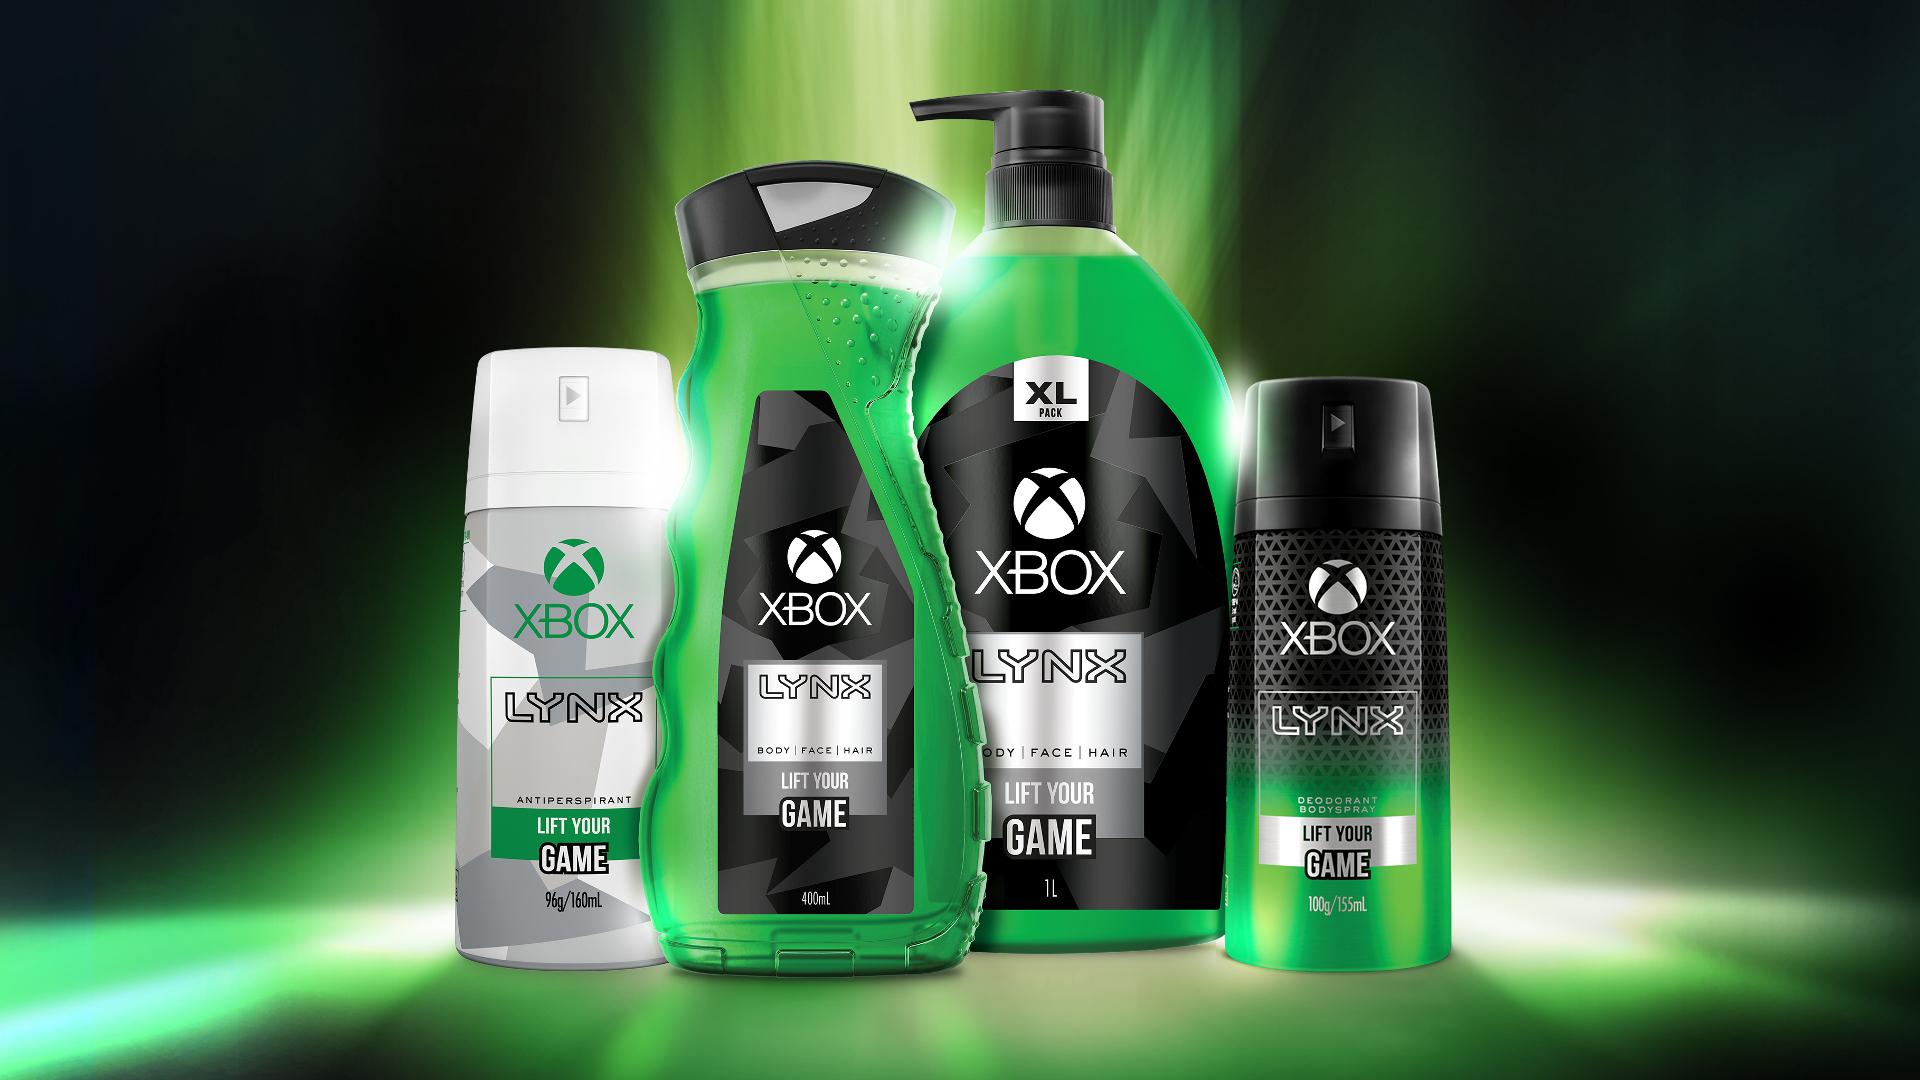 Microsoftが新しいXboxブランド「Xbox Lynx」を発売決定